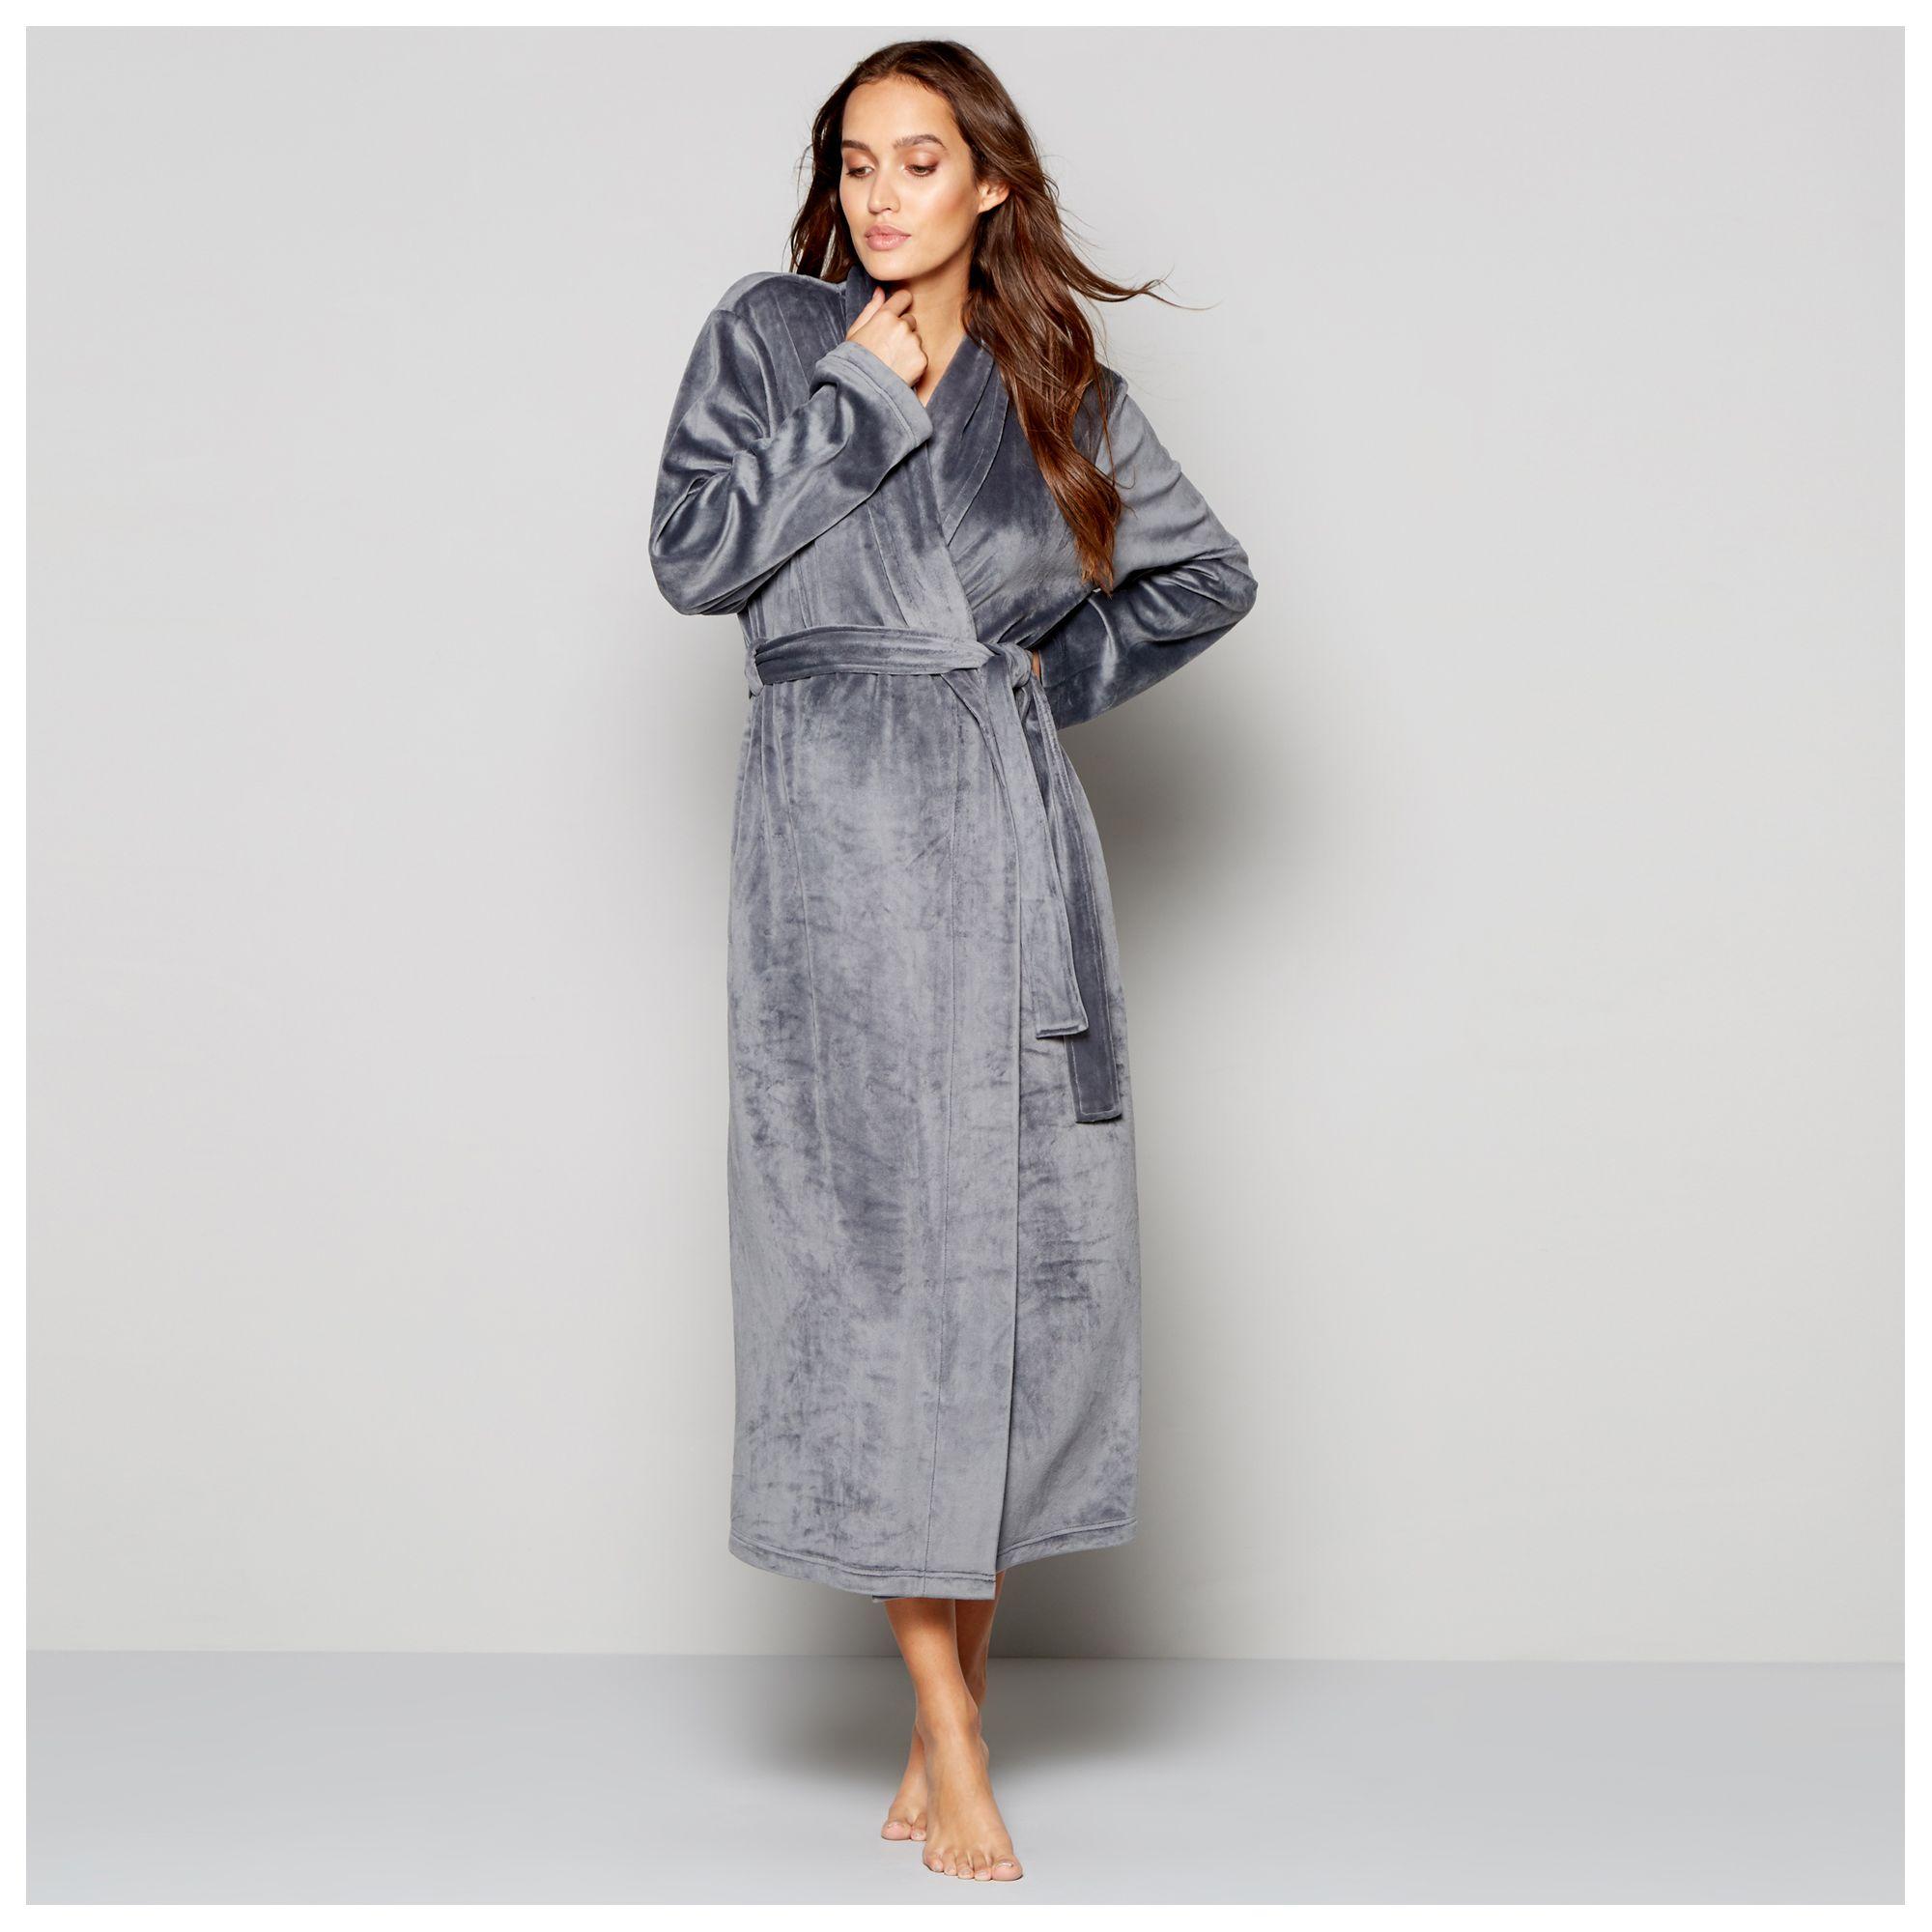 Attractive Debenhams Jasper Conran Dressing Gown Inspiration - Best ...